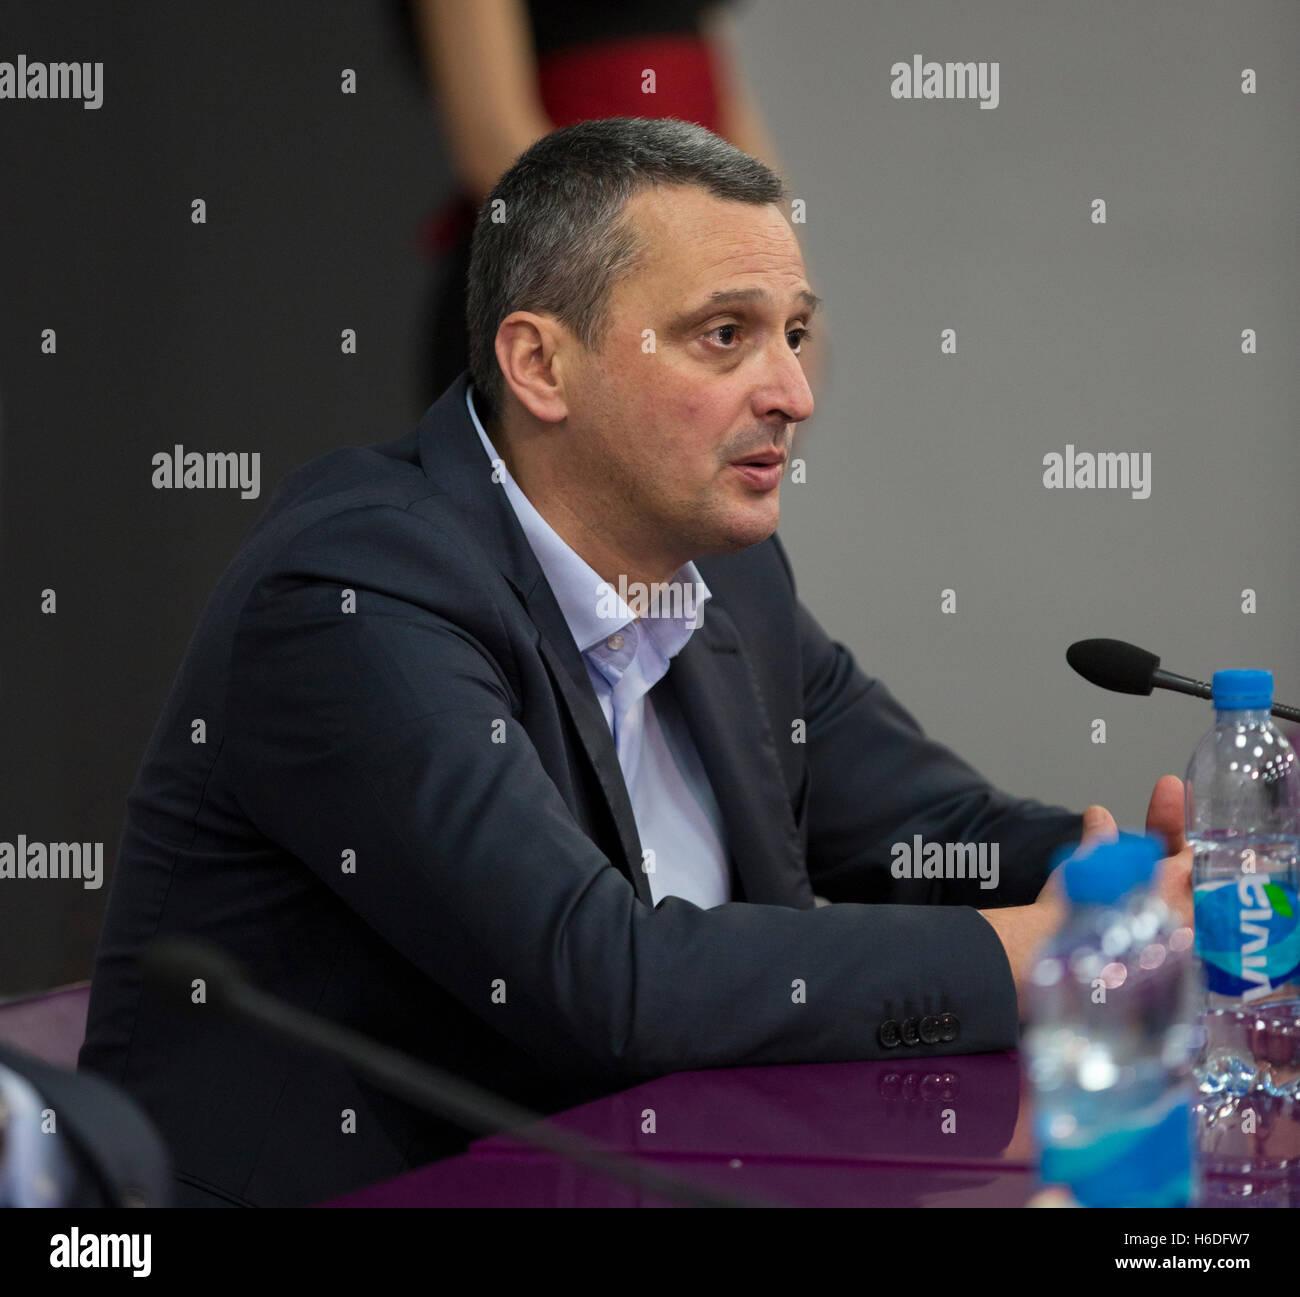 Head coach Dejan radonjic during 2016/2017 Turkish Airlines EuroLeague Regular Season Round 3 Crvena Zvezda mts - Stock Image